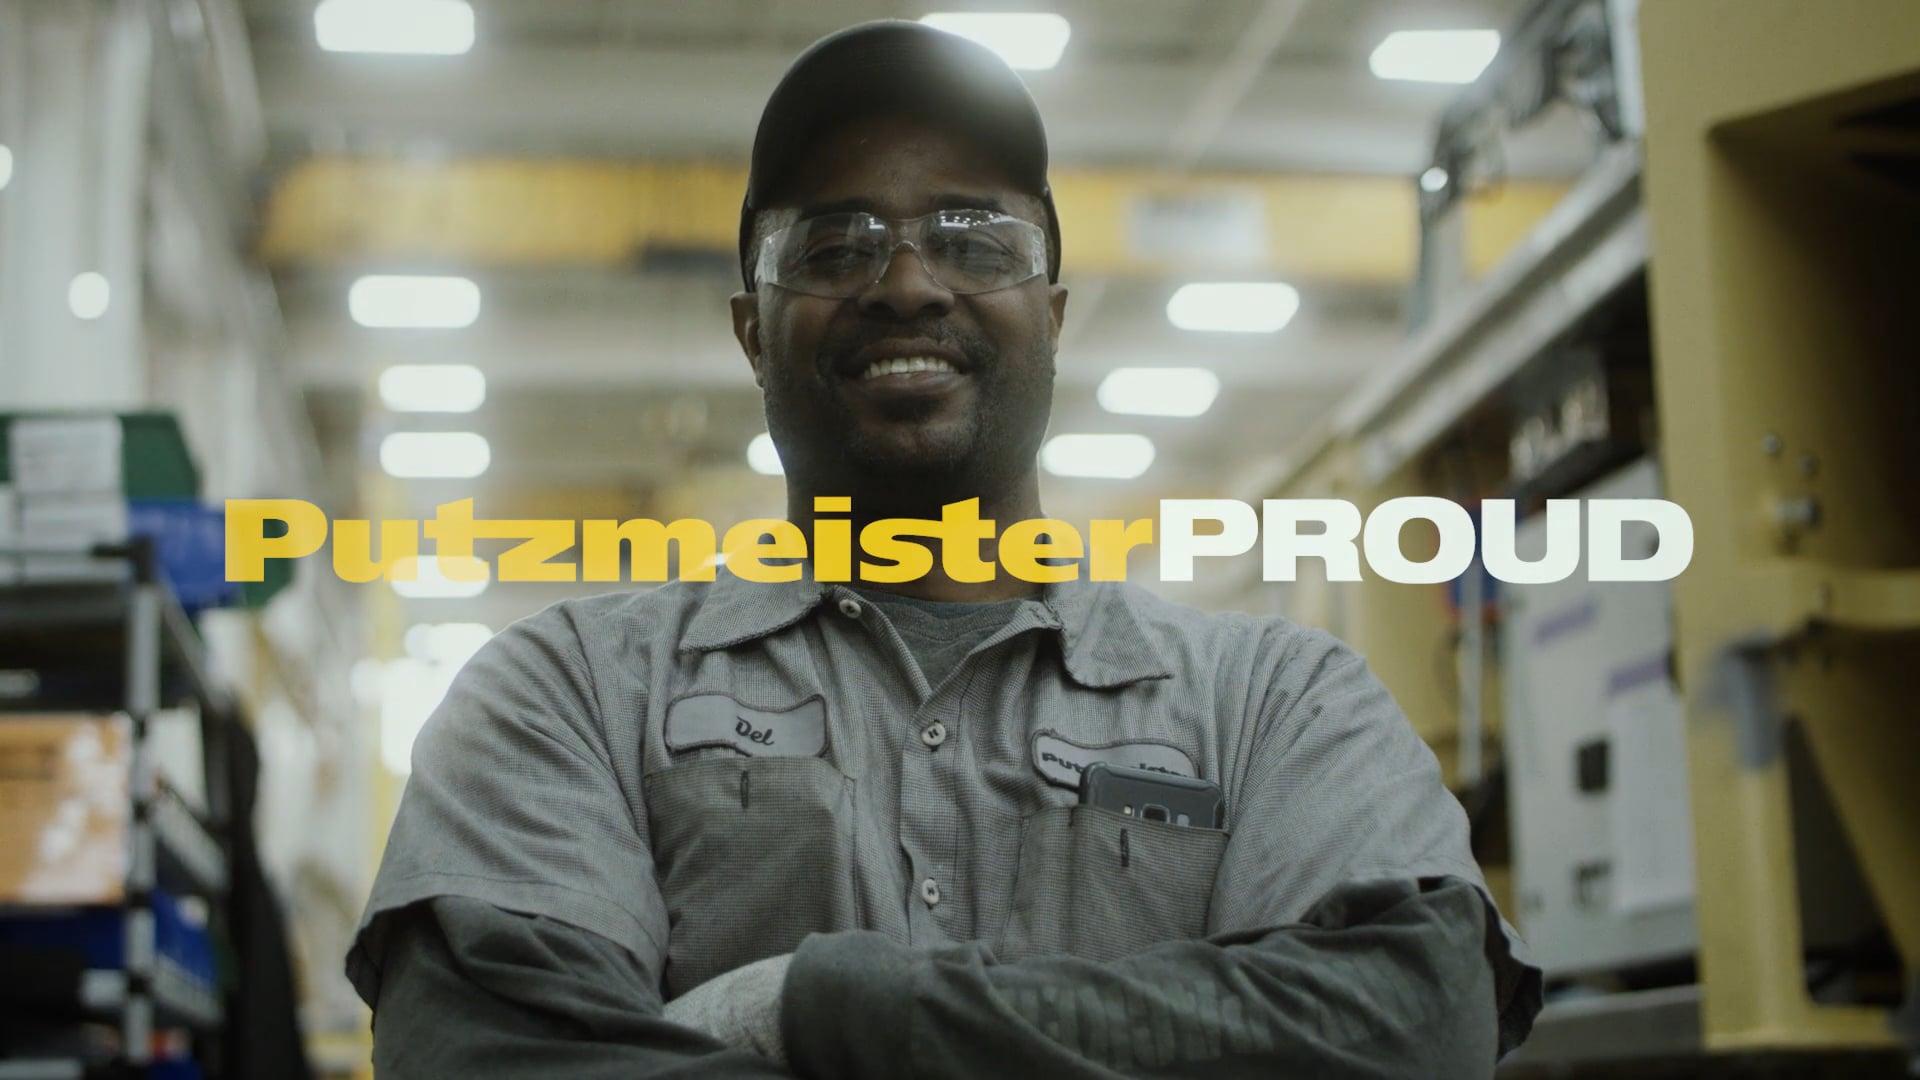 Putzmeister Proud - Del's Story